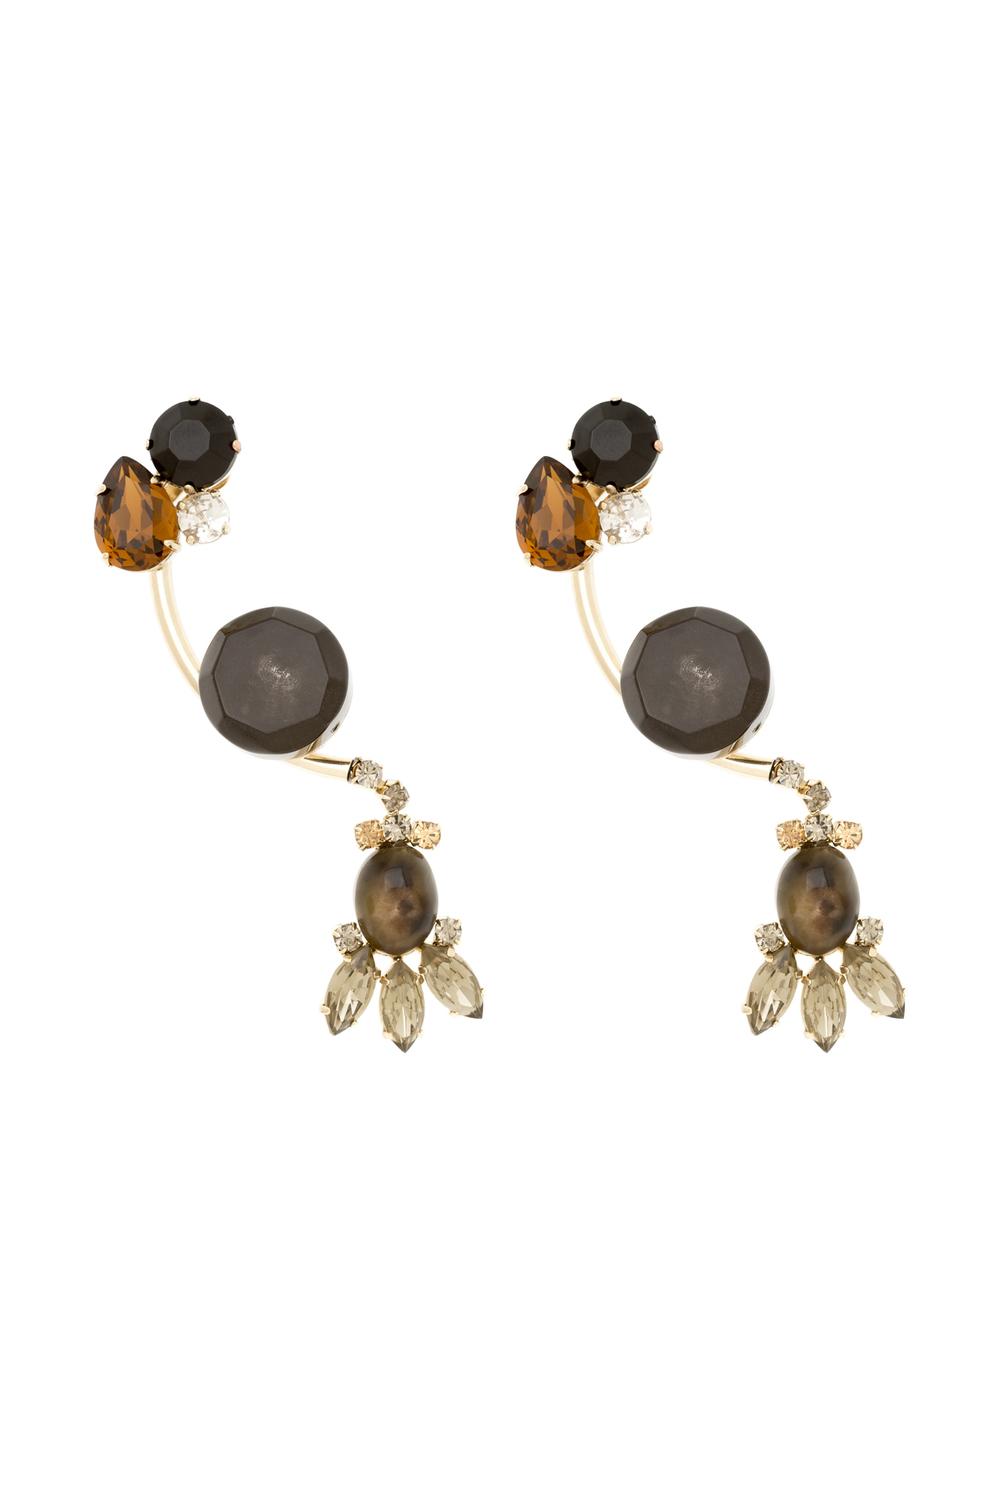 01-07-accessories-trends-fall-2015-estate-jewelry.jpg